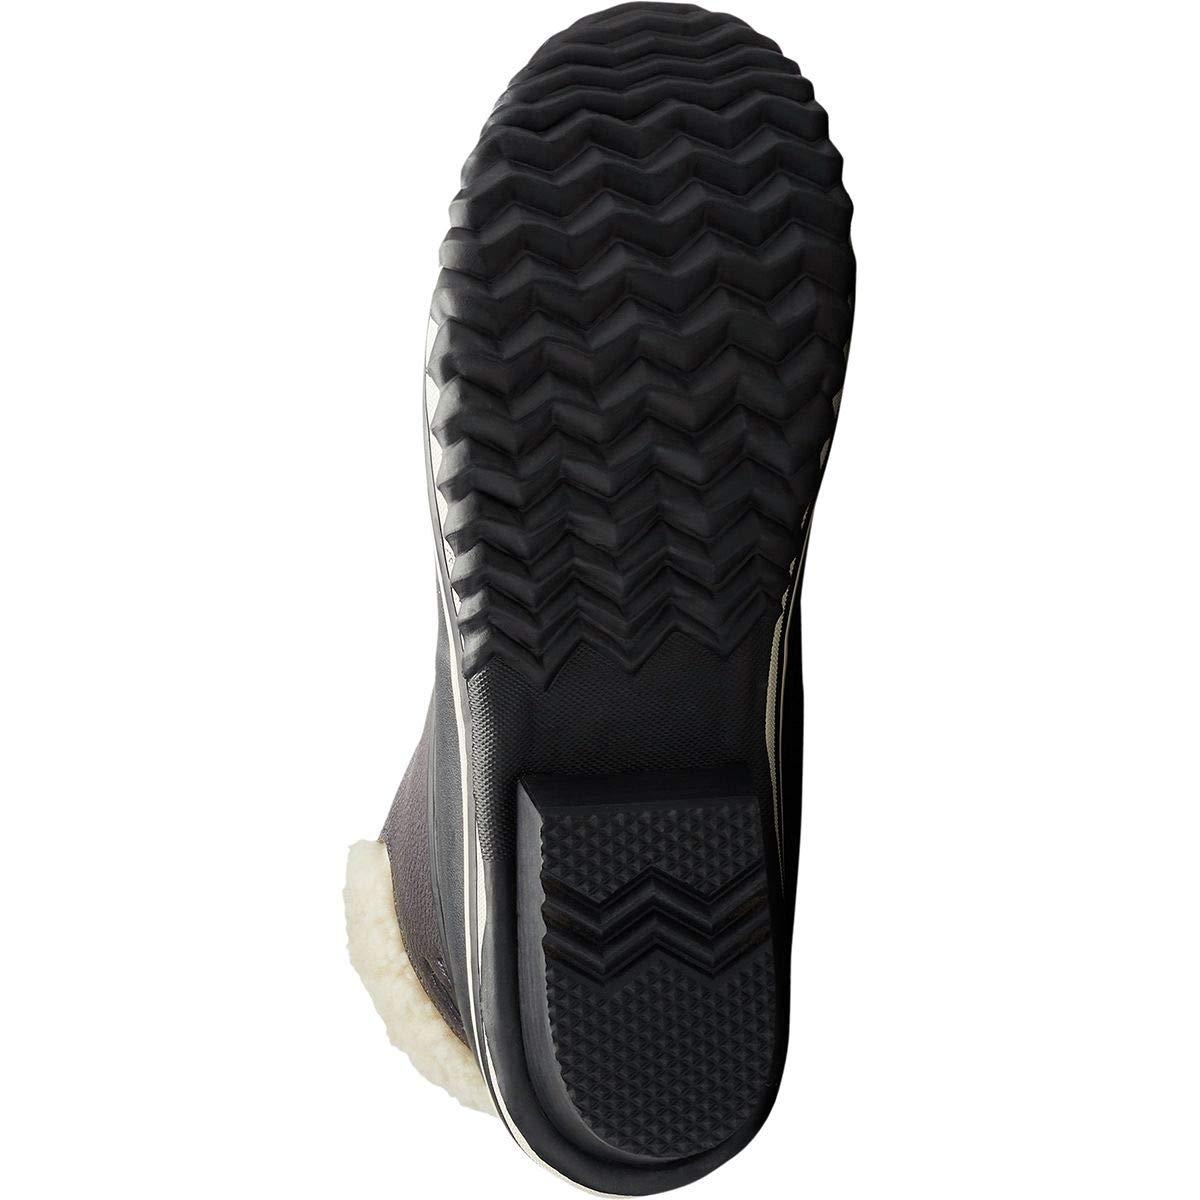 Womens SOREL Slimpack II Lace Shearling Boot